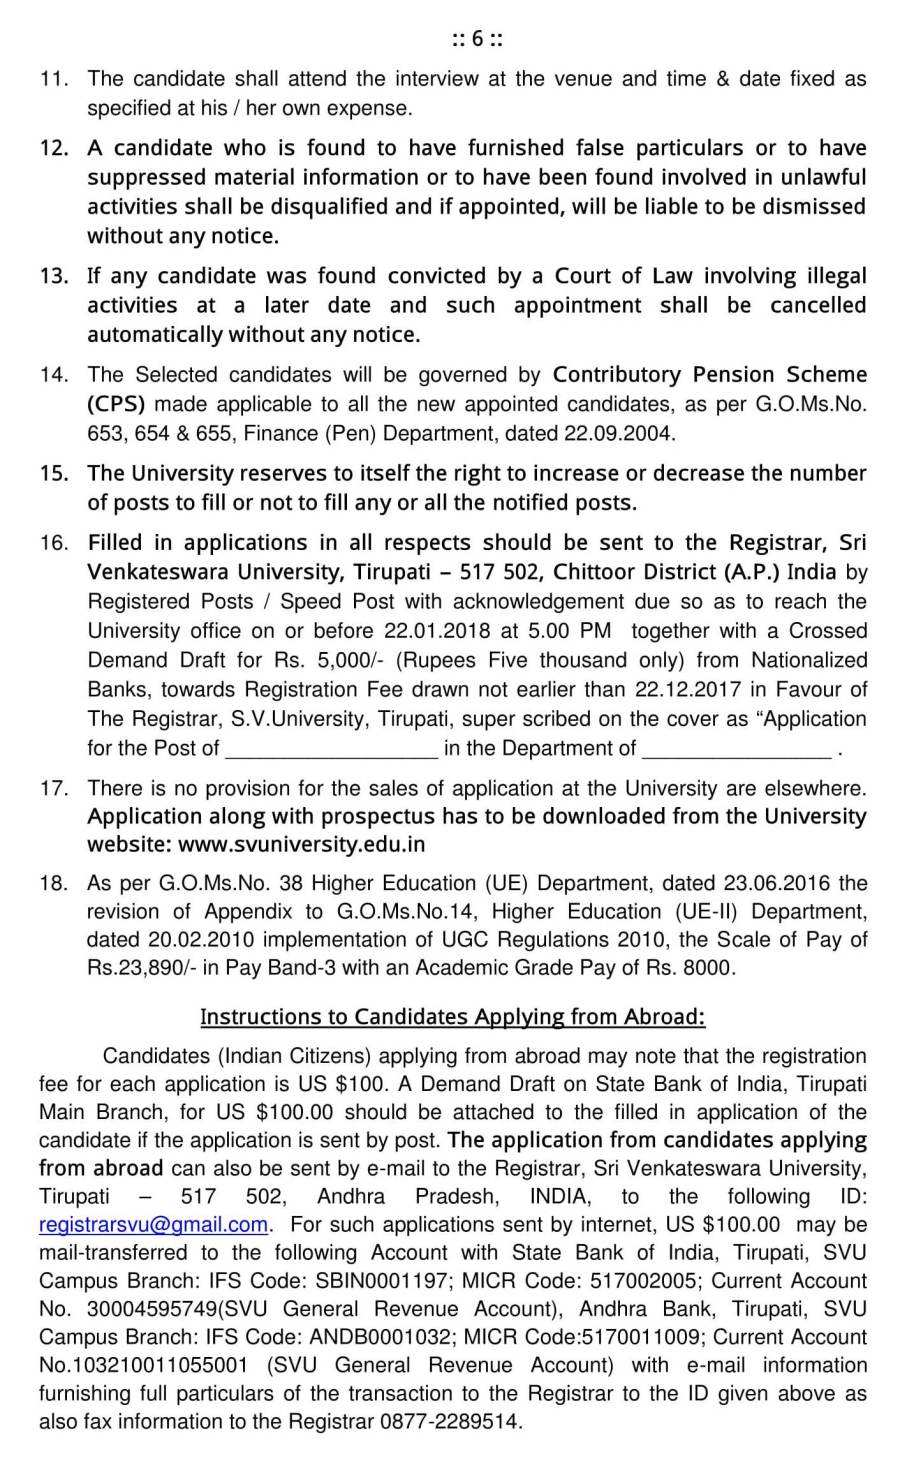 20171224111251515_Notification-for-recruitment-of-Associate-Professor-Posts-2017_3-6.jpg